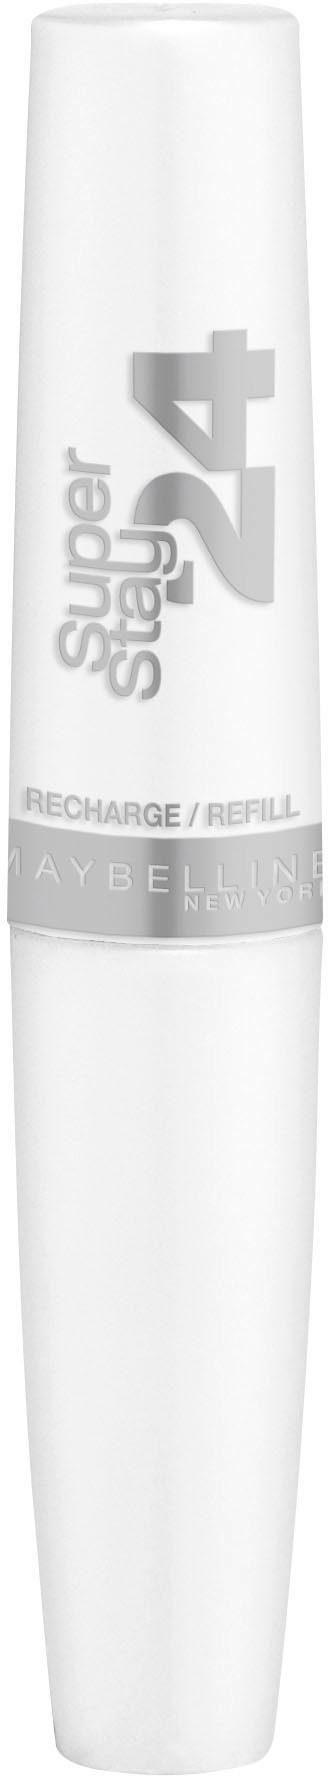 Maybelline New York, »Superstay Pflegebalsam«, Lippenpflege